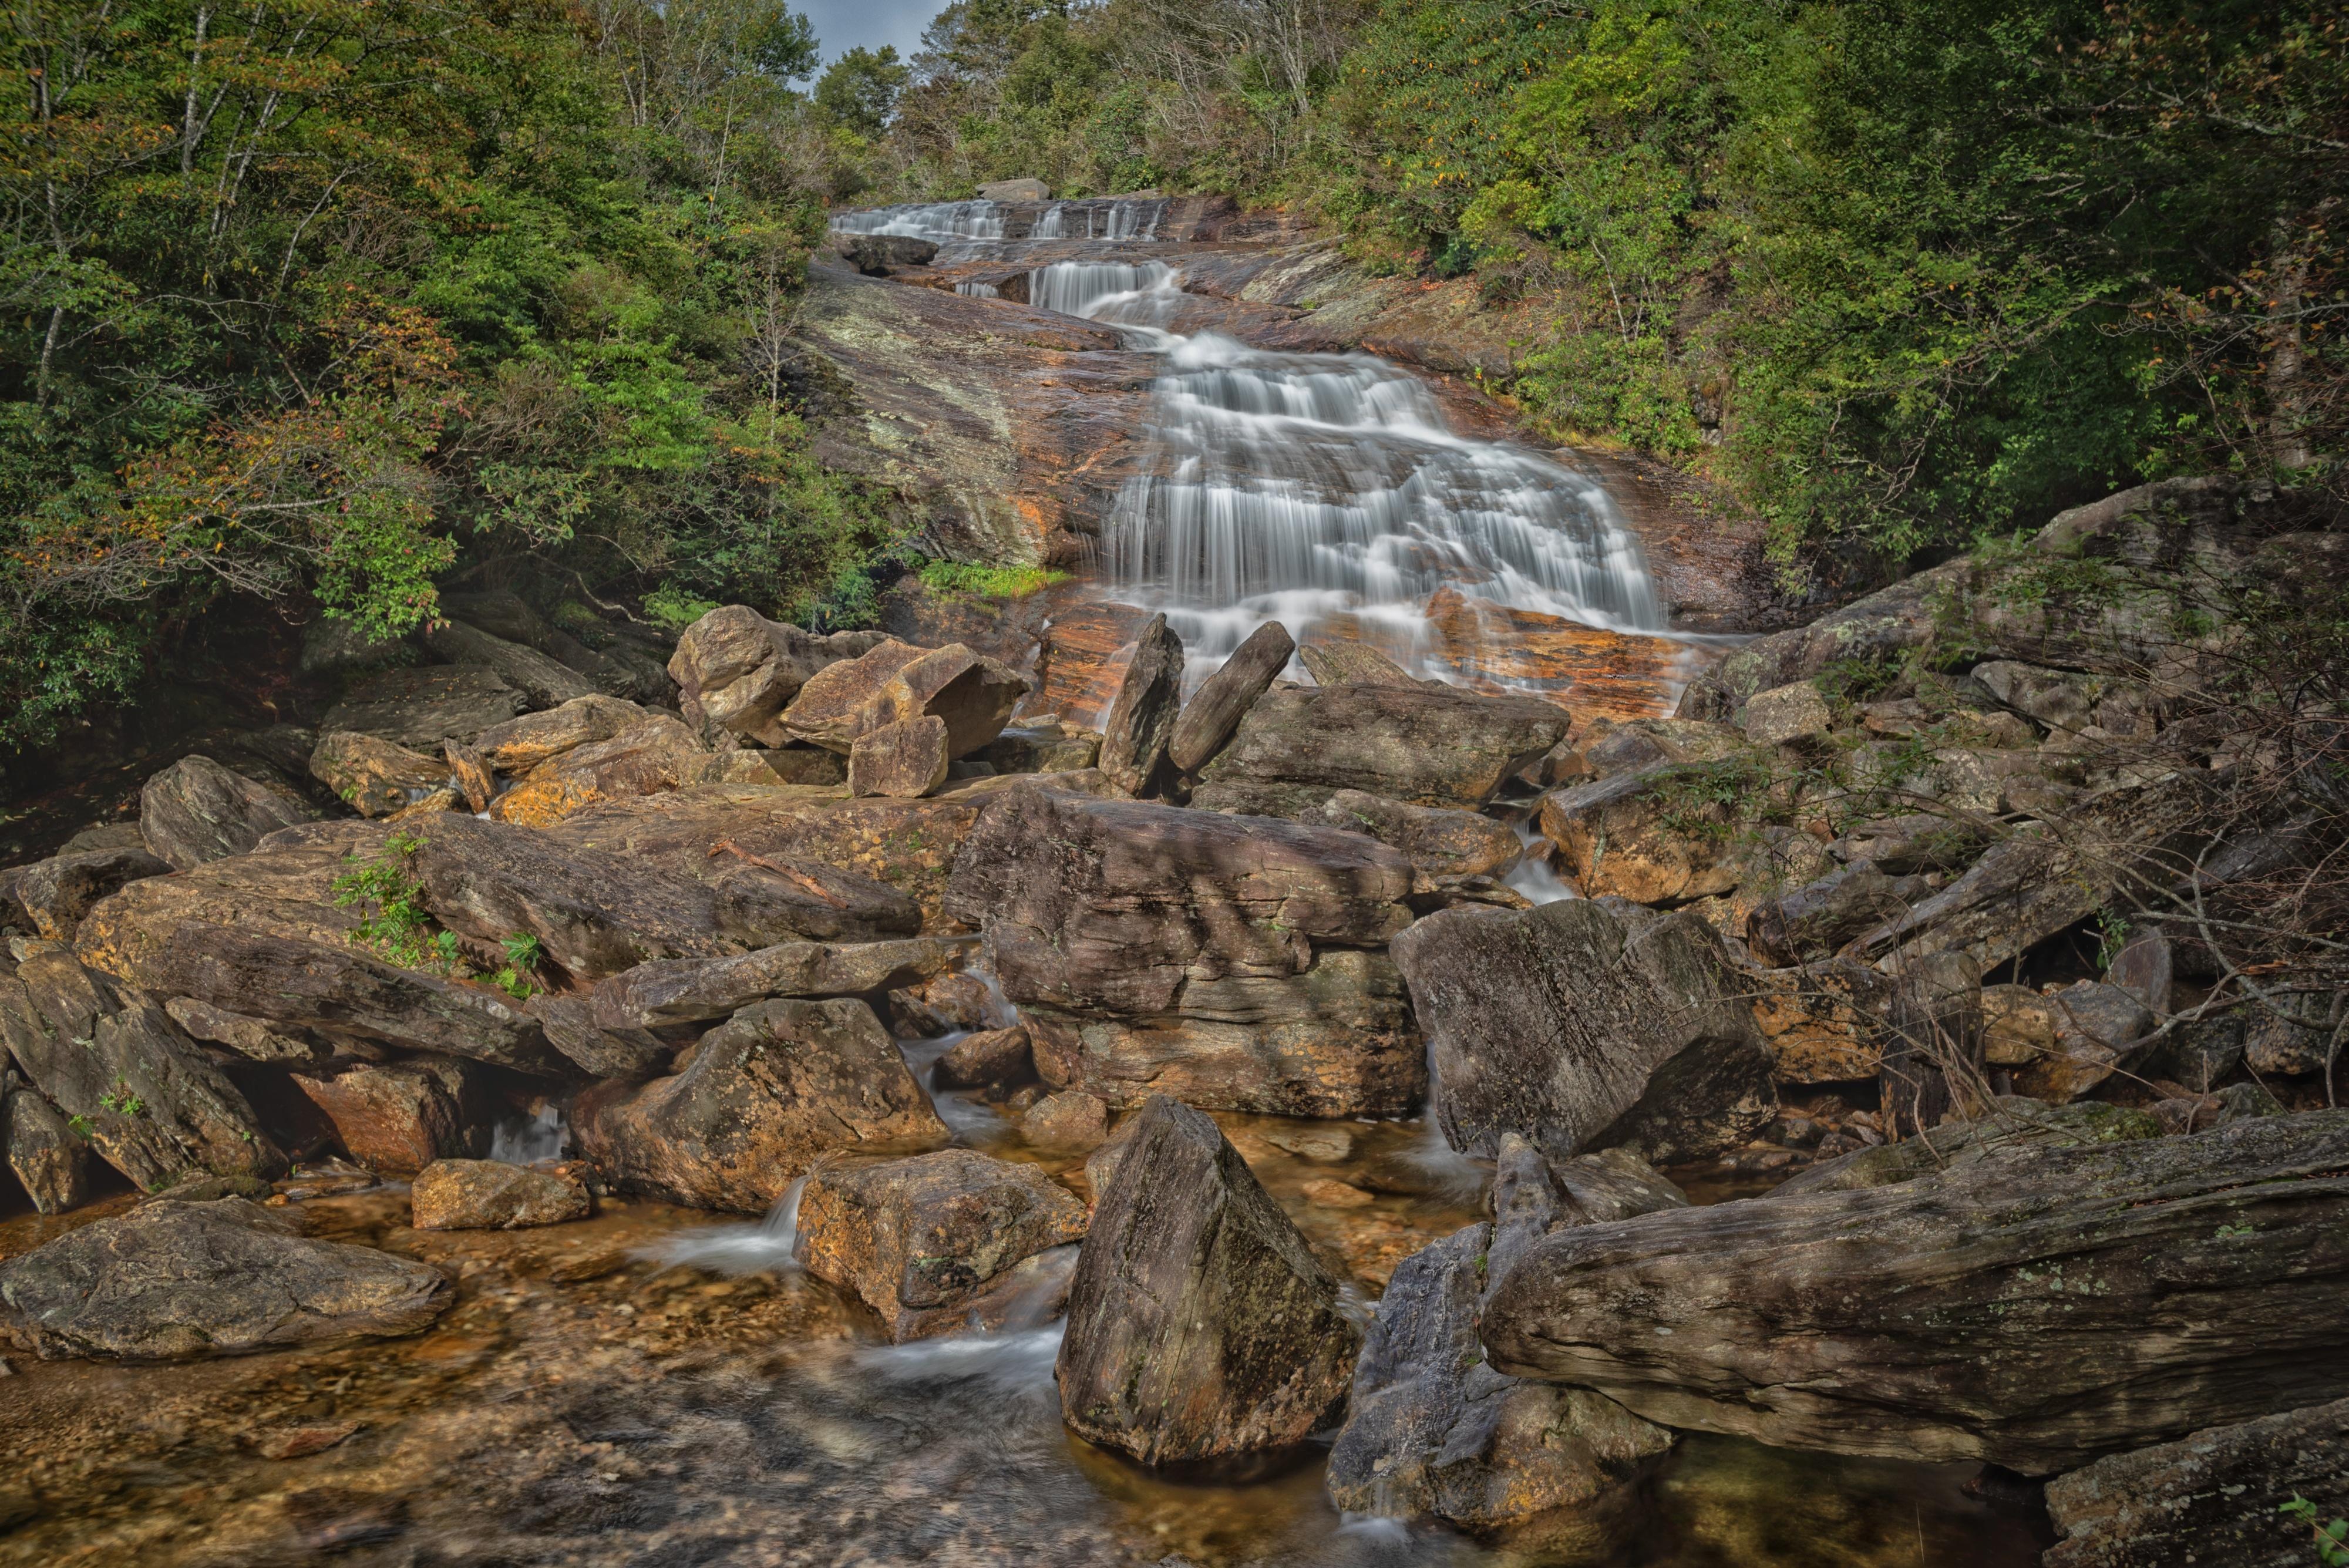 Фотография США North Carolina Природа Водопады речка Камни 4000x2670 штаты америка река Реки Камень